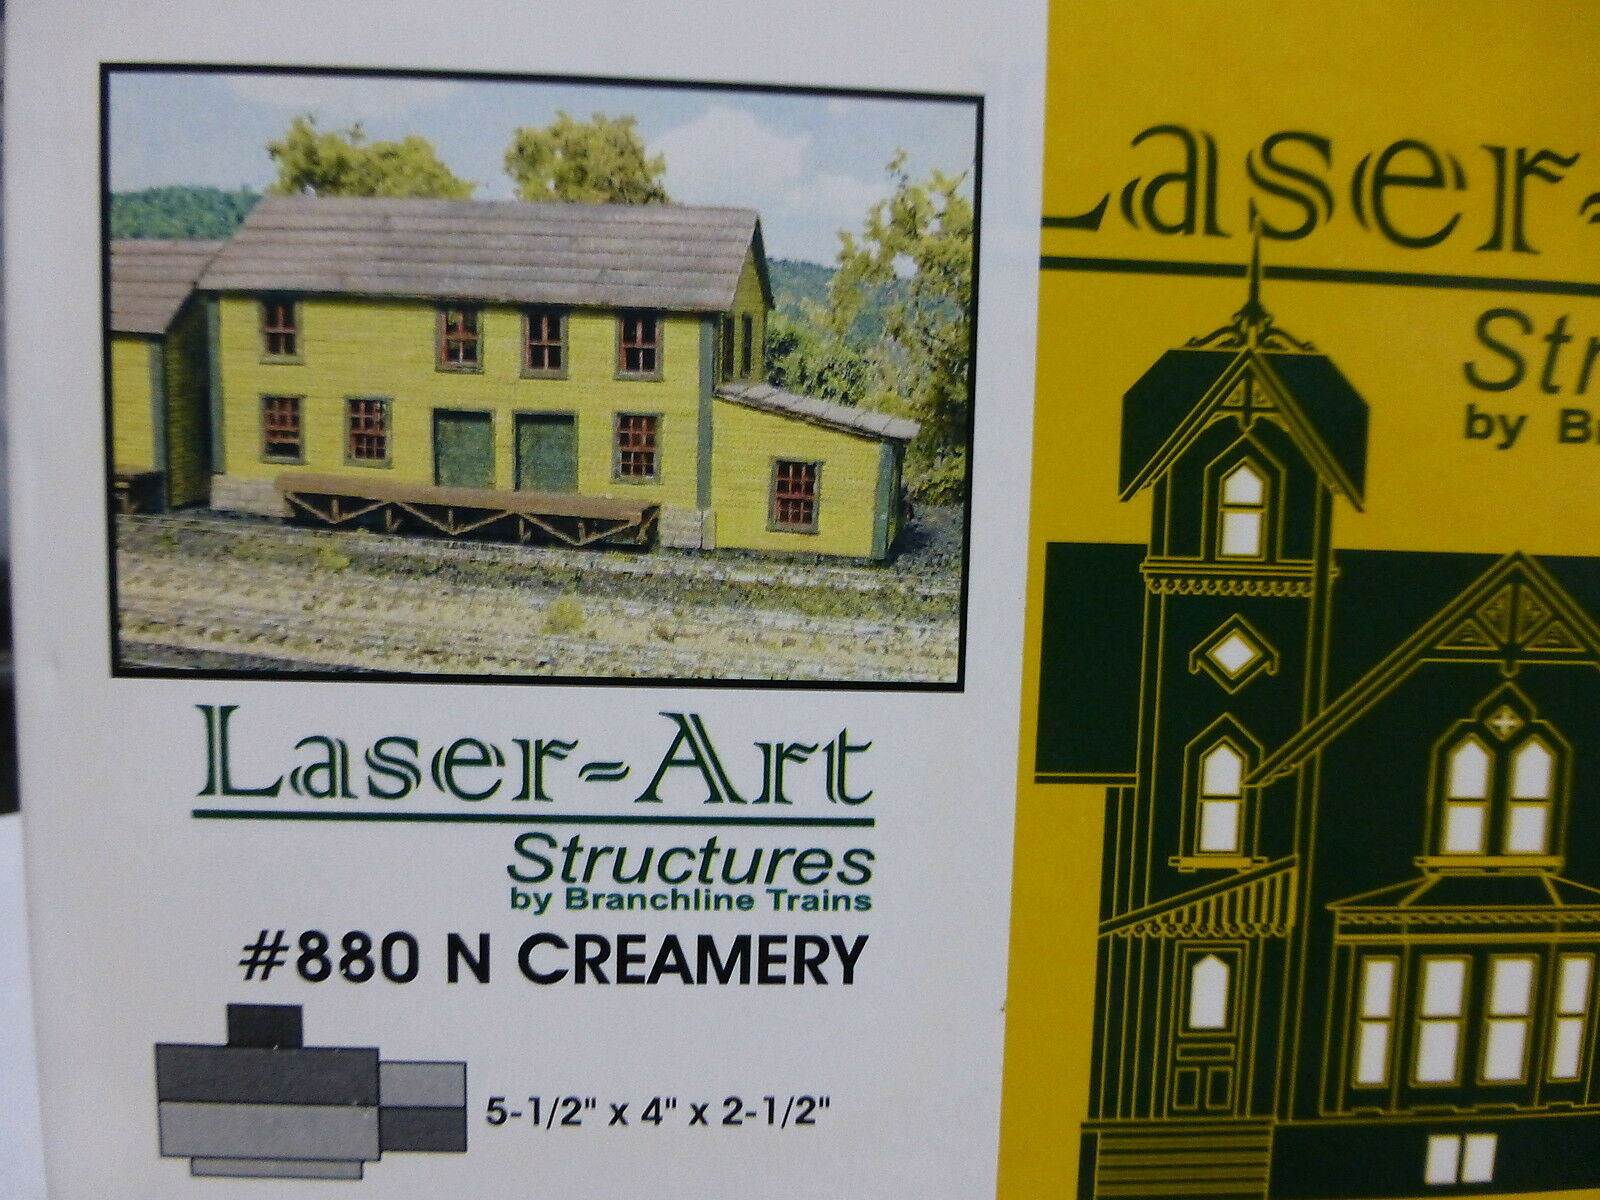 Branchline N Creamery 5-1 2  x 4  x 2-1 2  Laser-Art Kit Form